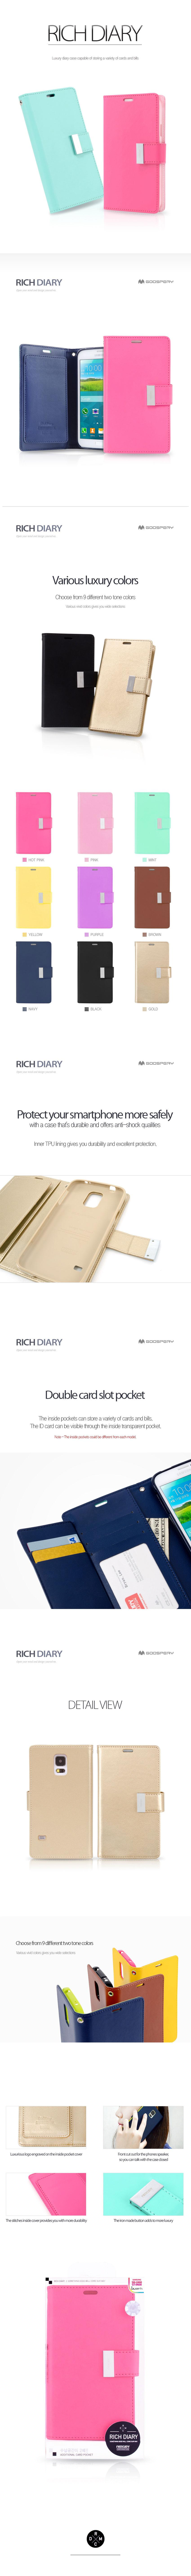 rich-diary-detail-eng.jpg